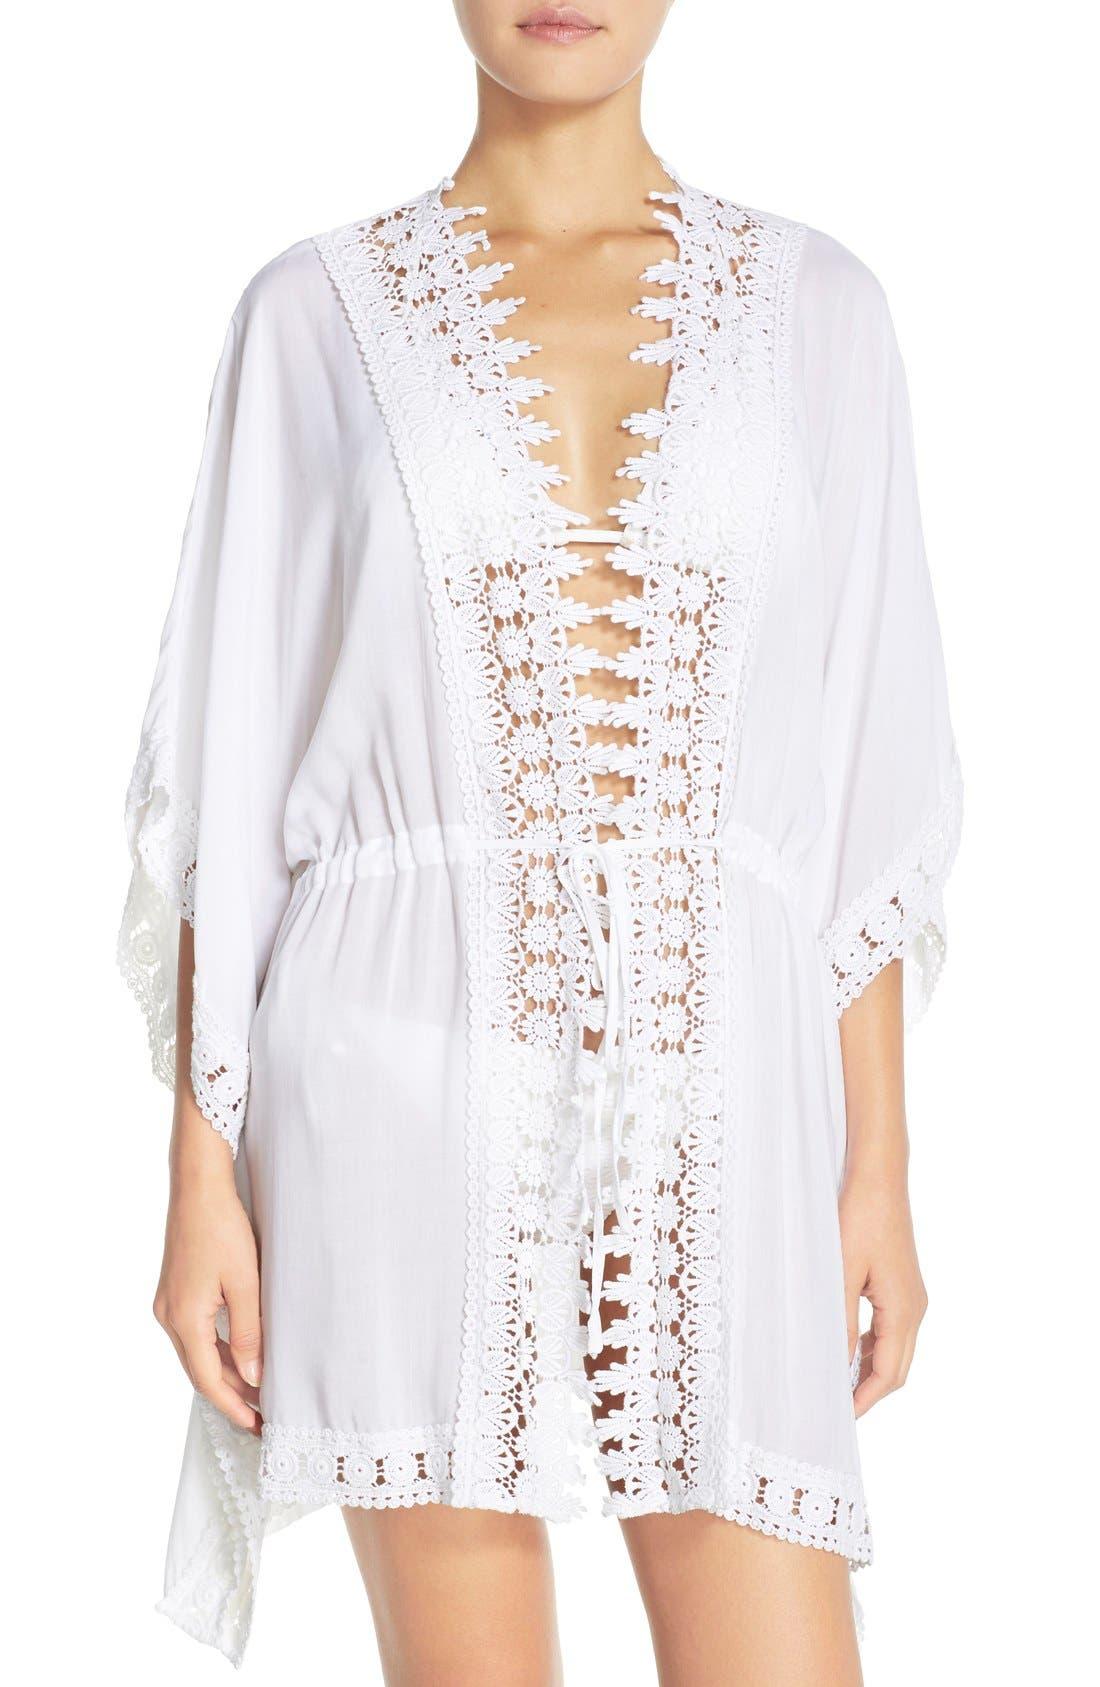 Alternate Image 1 Selected - La Blanca 'Costa Brava' Crochet Cover-Up Kimono